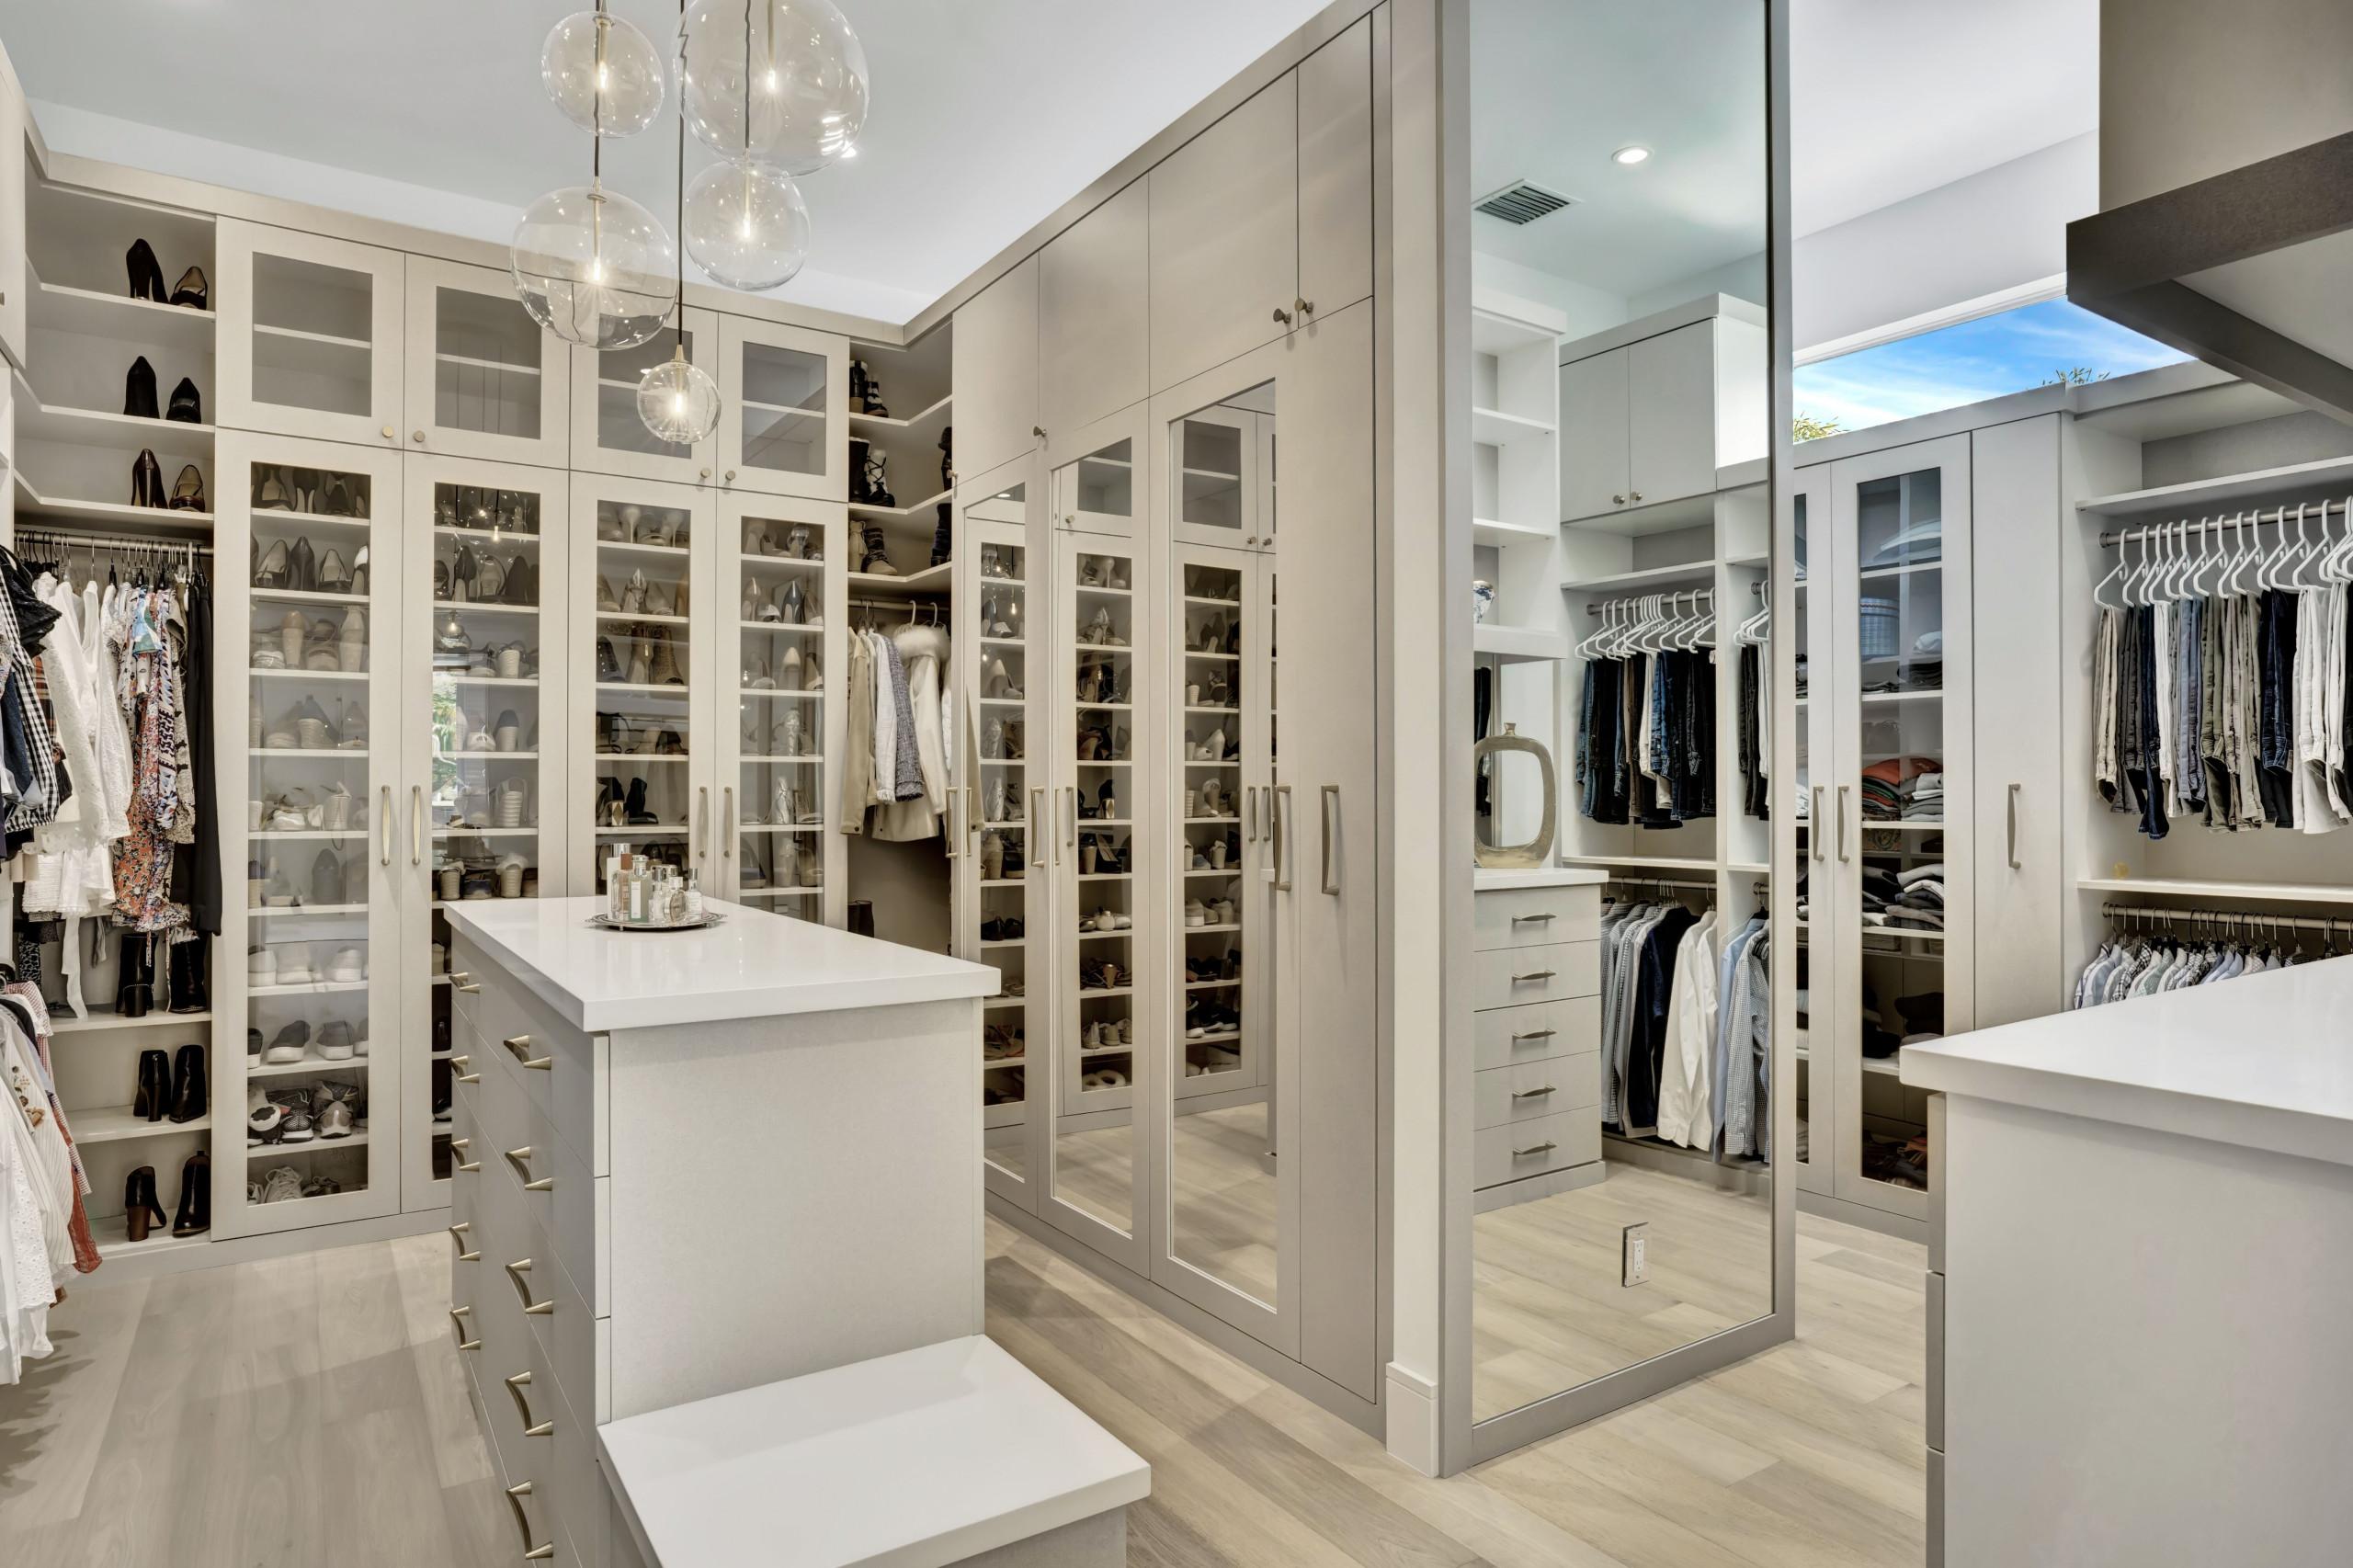 75 Beautiful Walk In Closet Pictures Ideas February 2021 Houzz